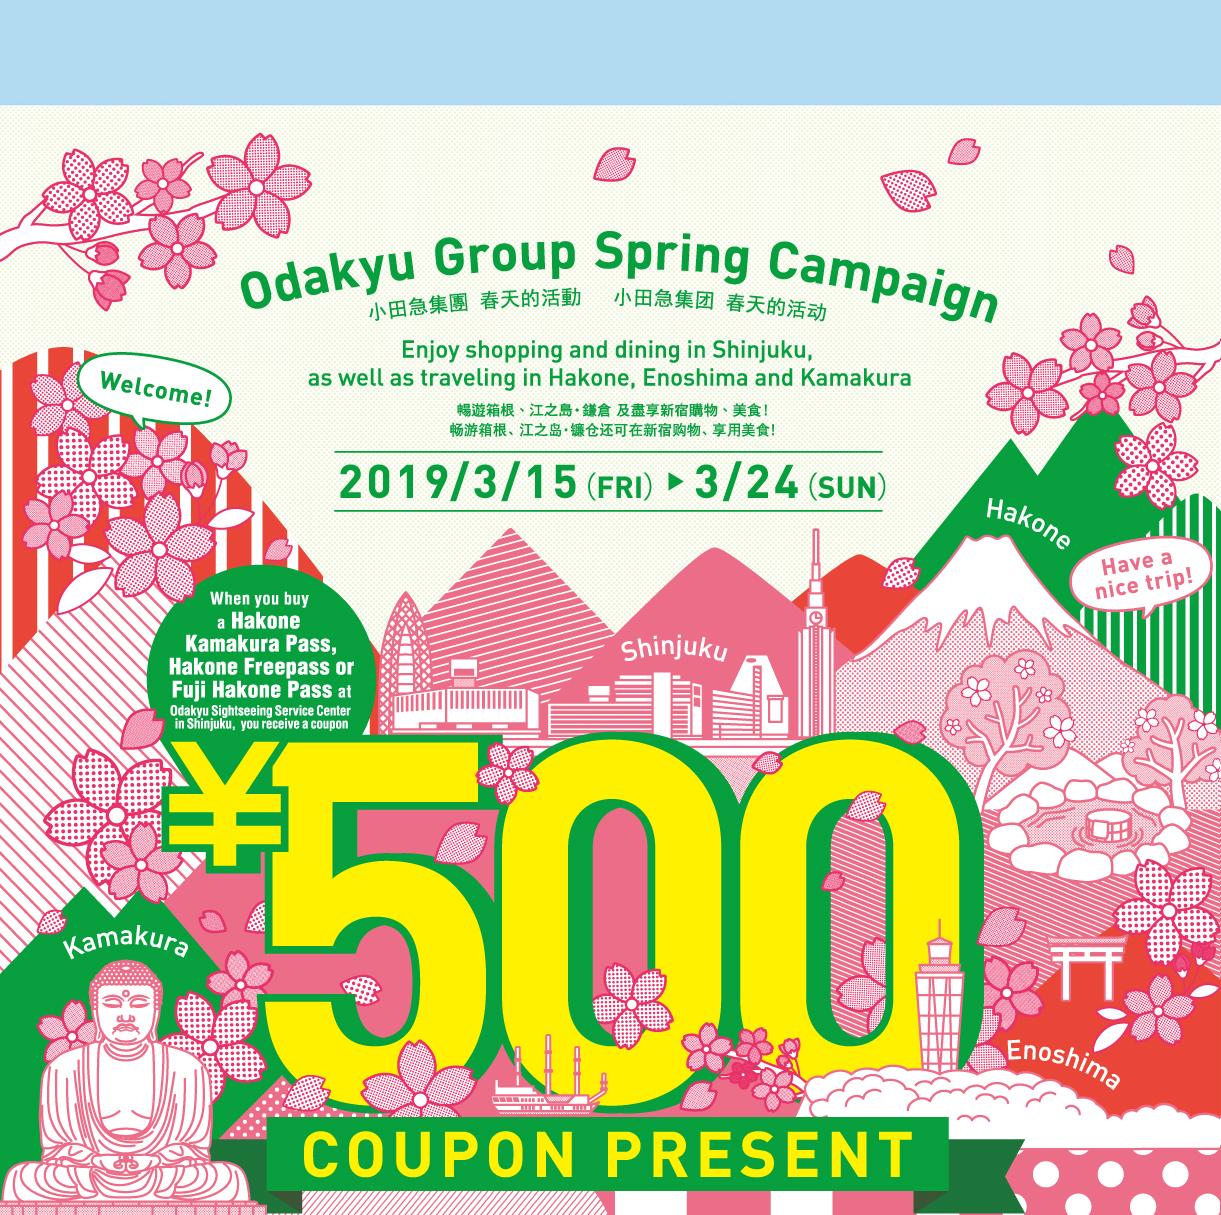 Odakyu Group Lunar New Year Campaign